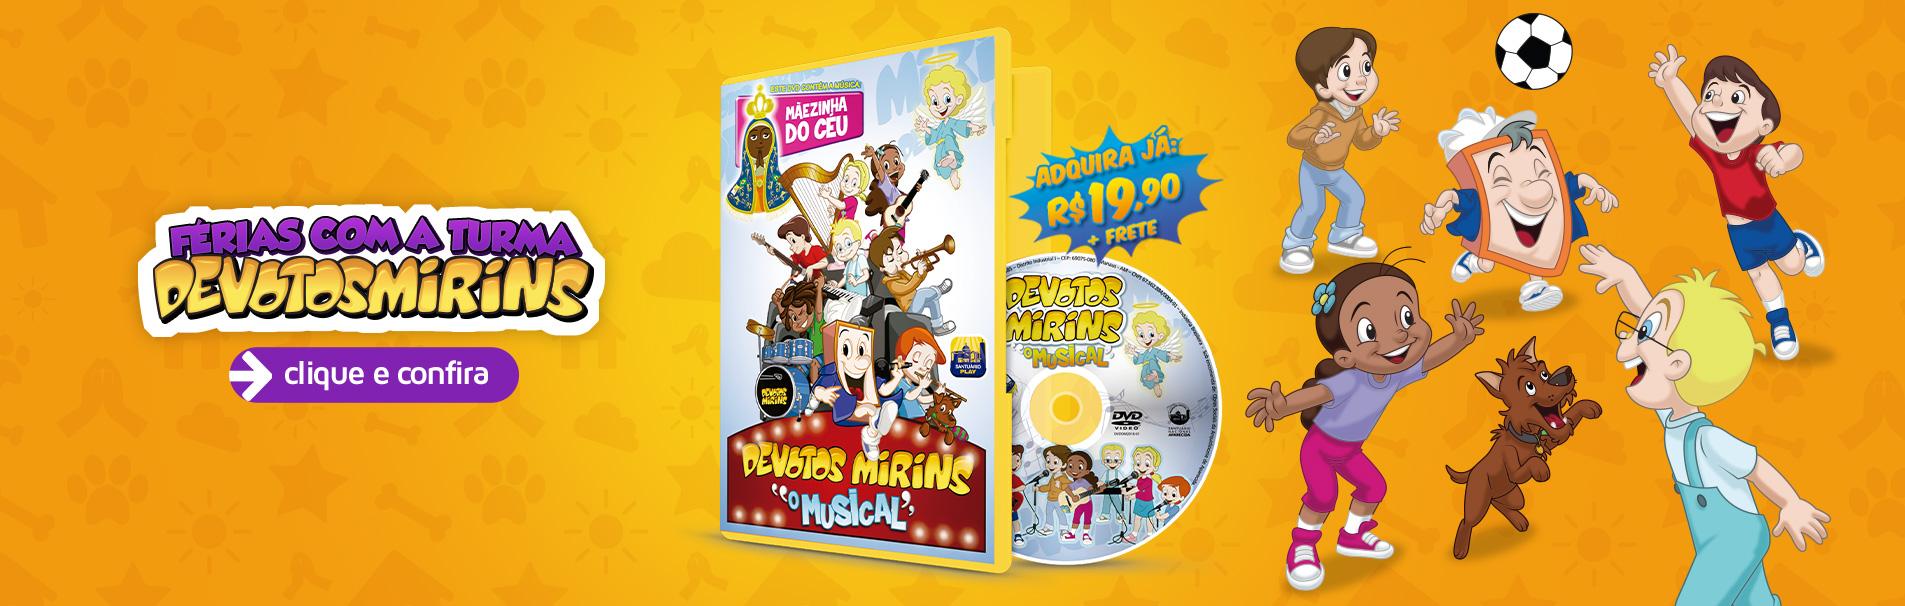 DVD O Musical